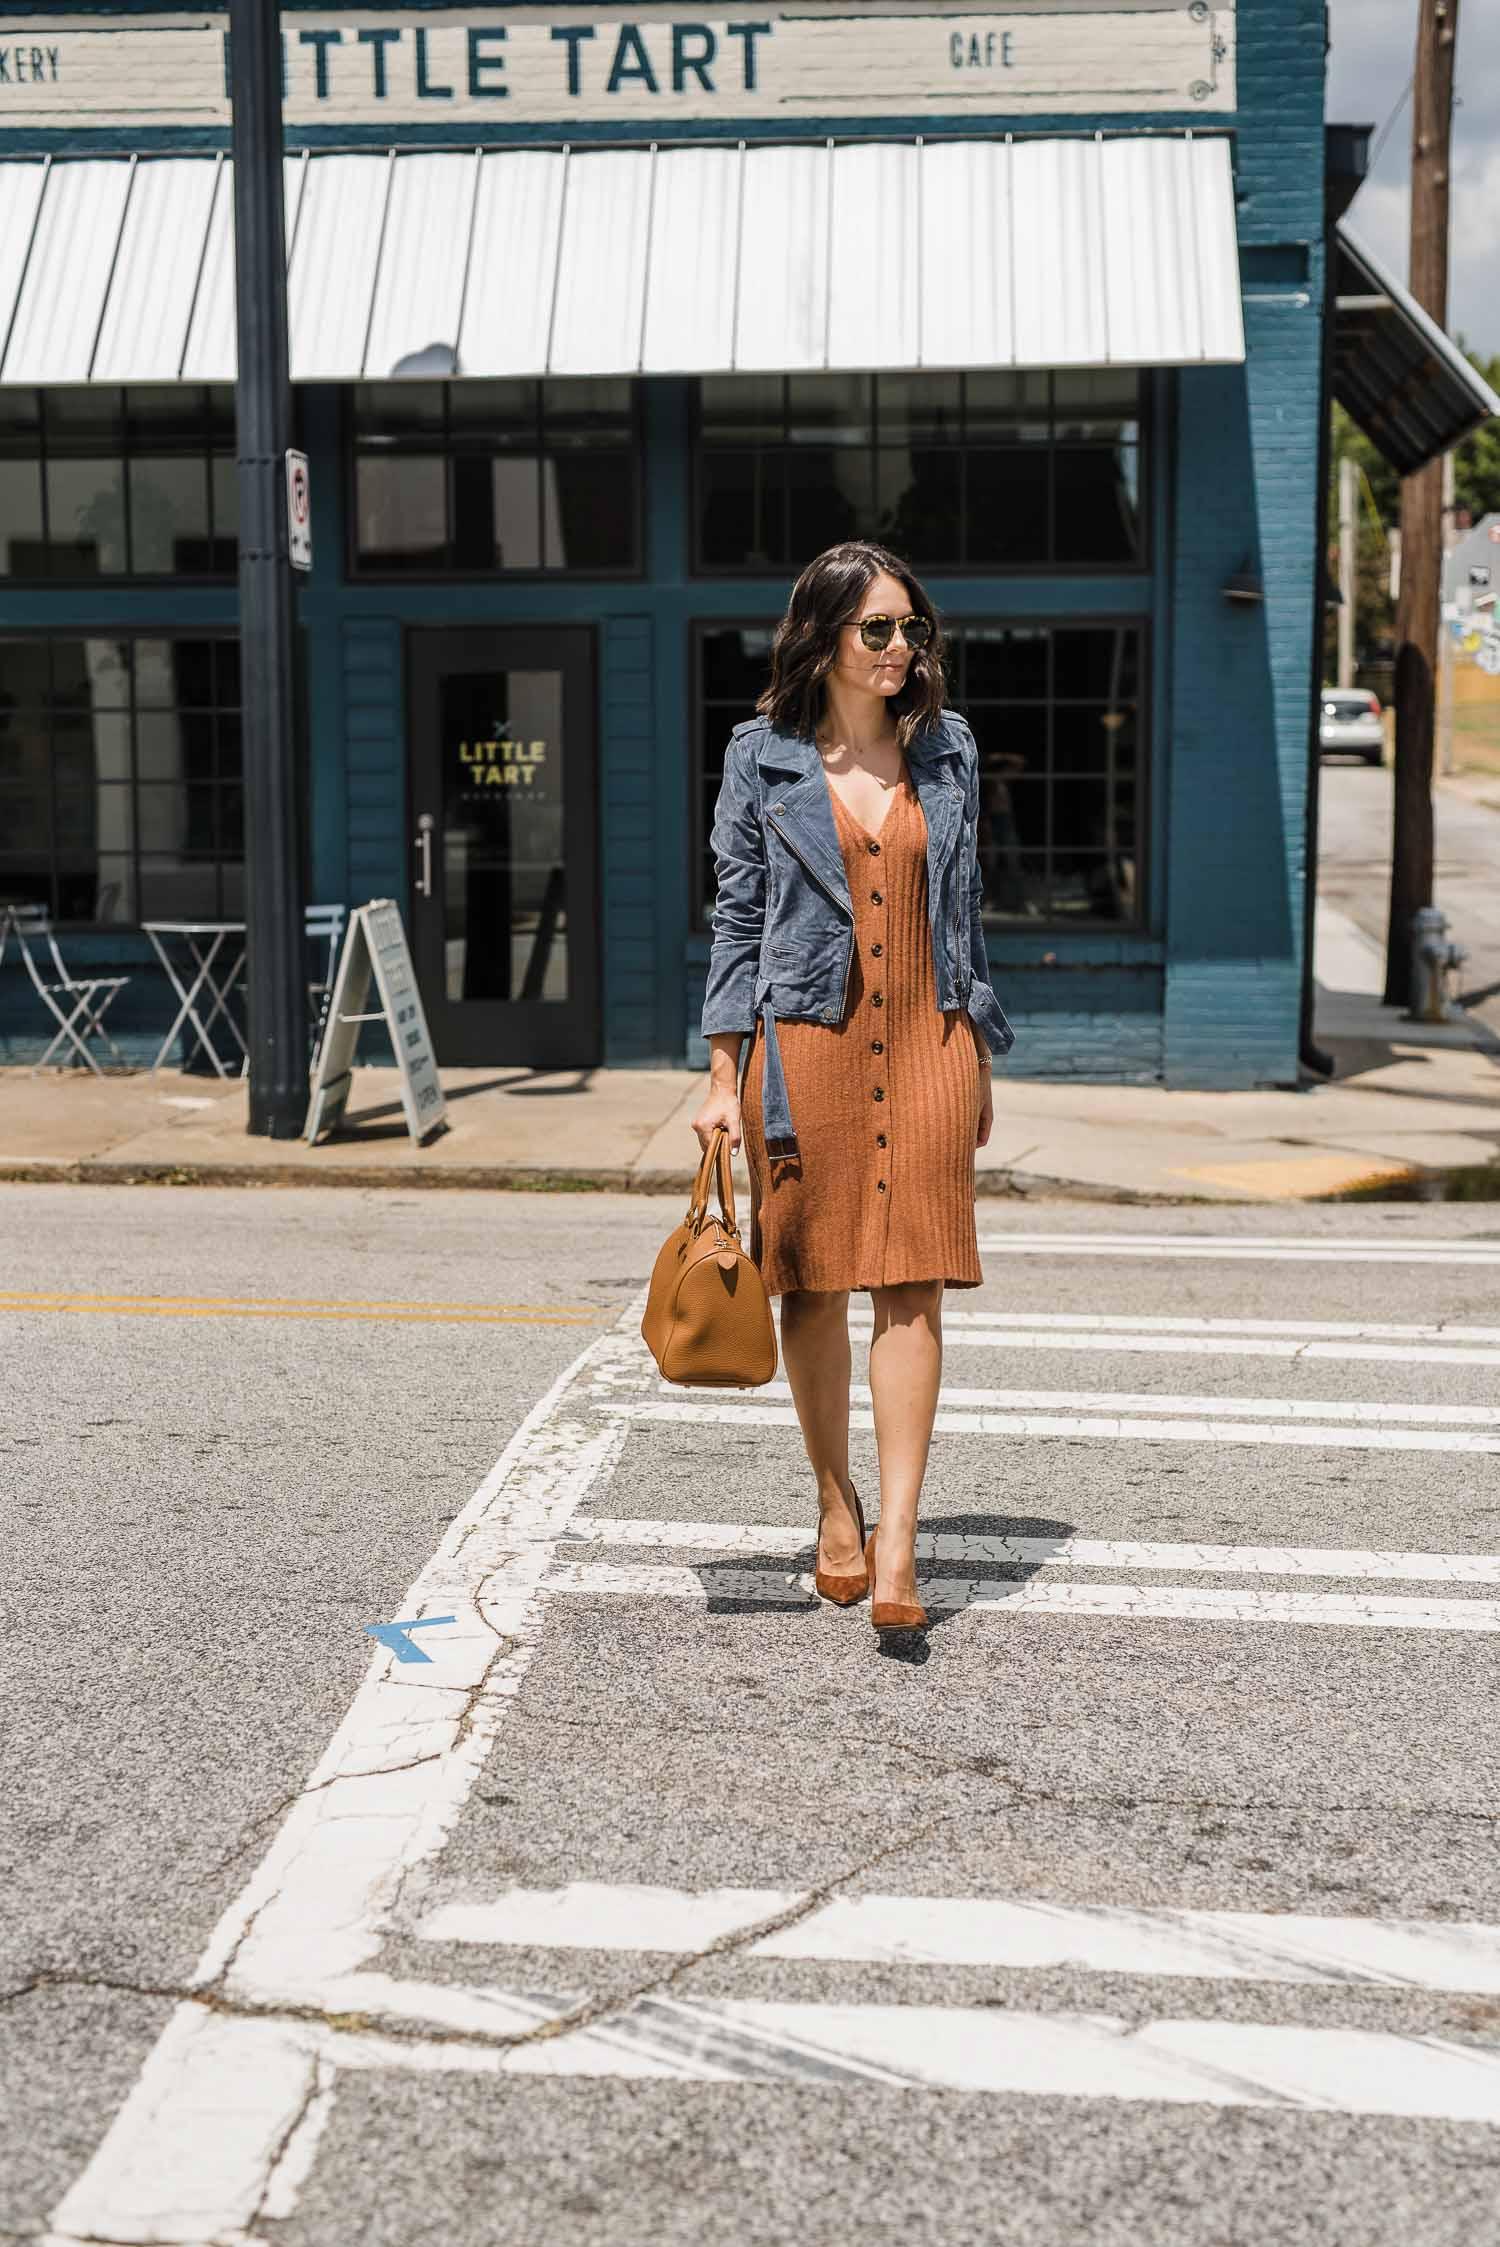 a girl walks across the street in a biege dress and heels